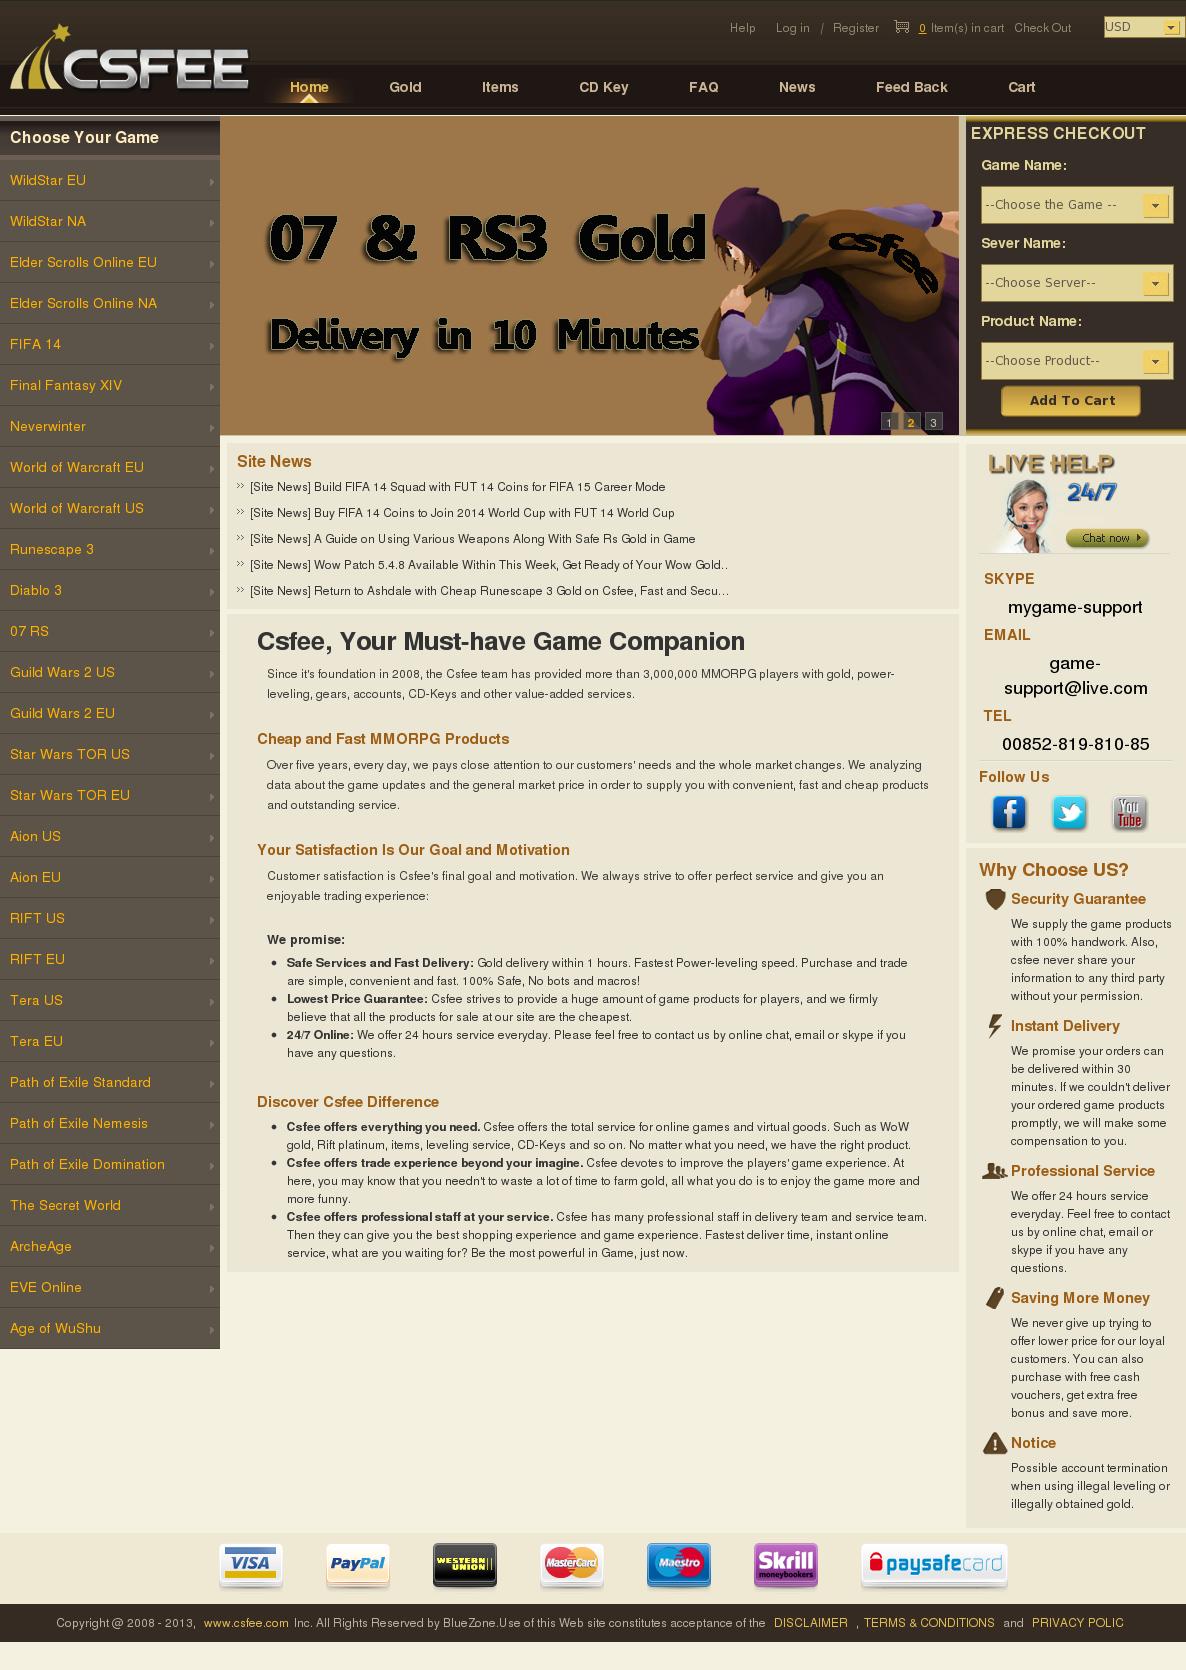 Csfee Competitors, Revenue and Employees - Owler Company Profile